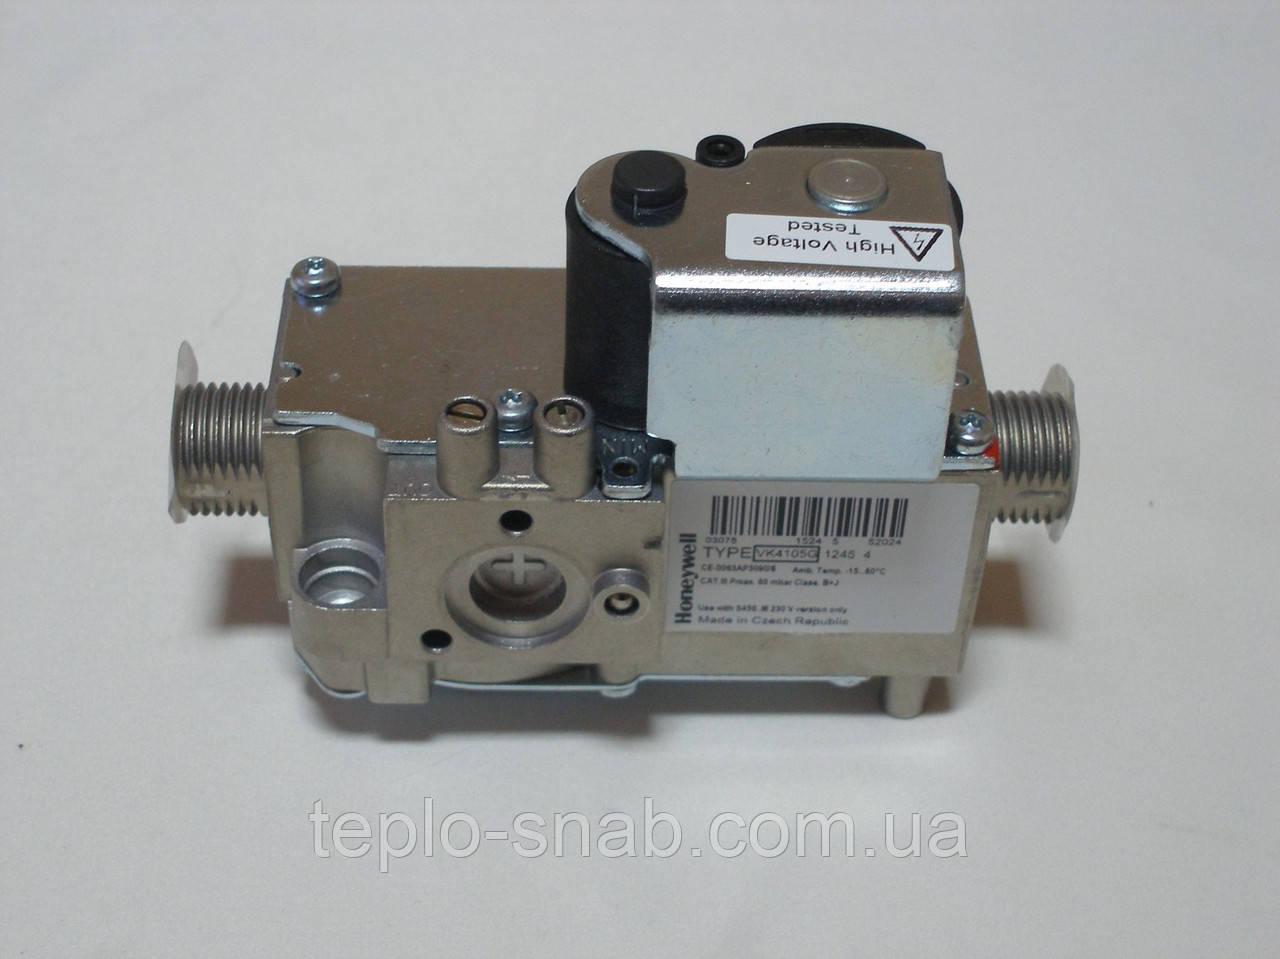 Газовый клапан Honeywell VK4105G1245U. Ferroli Domiproject,C24,F24,C32,F32 FerEasy C24,F24,C32,F32. 39819620